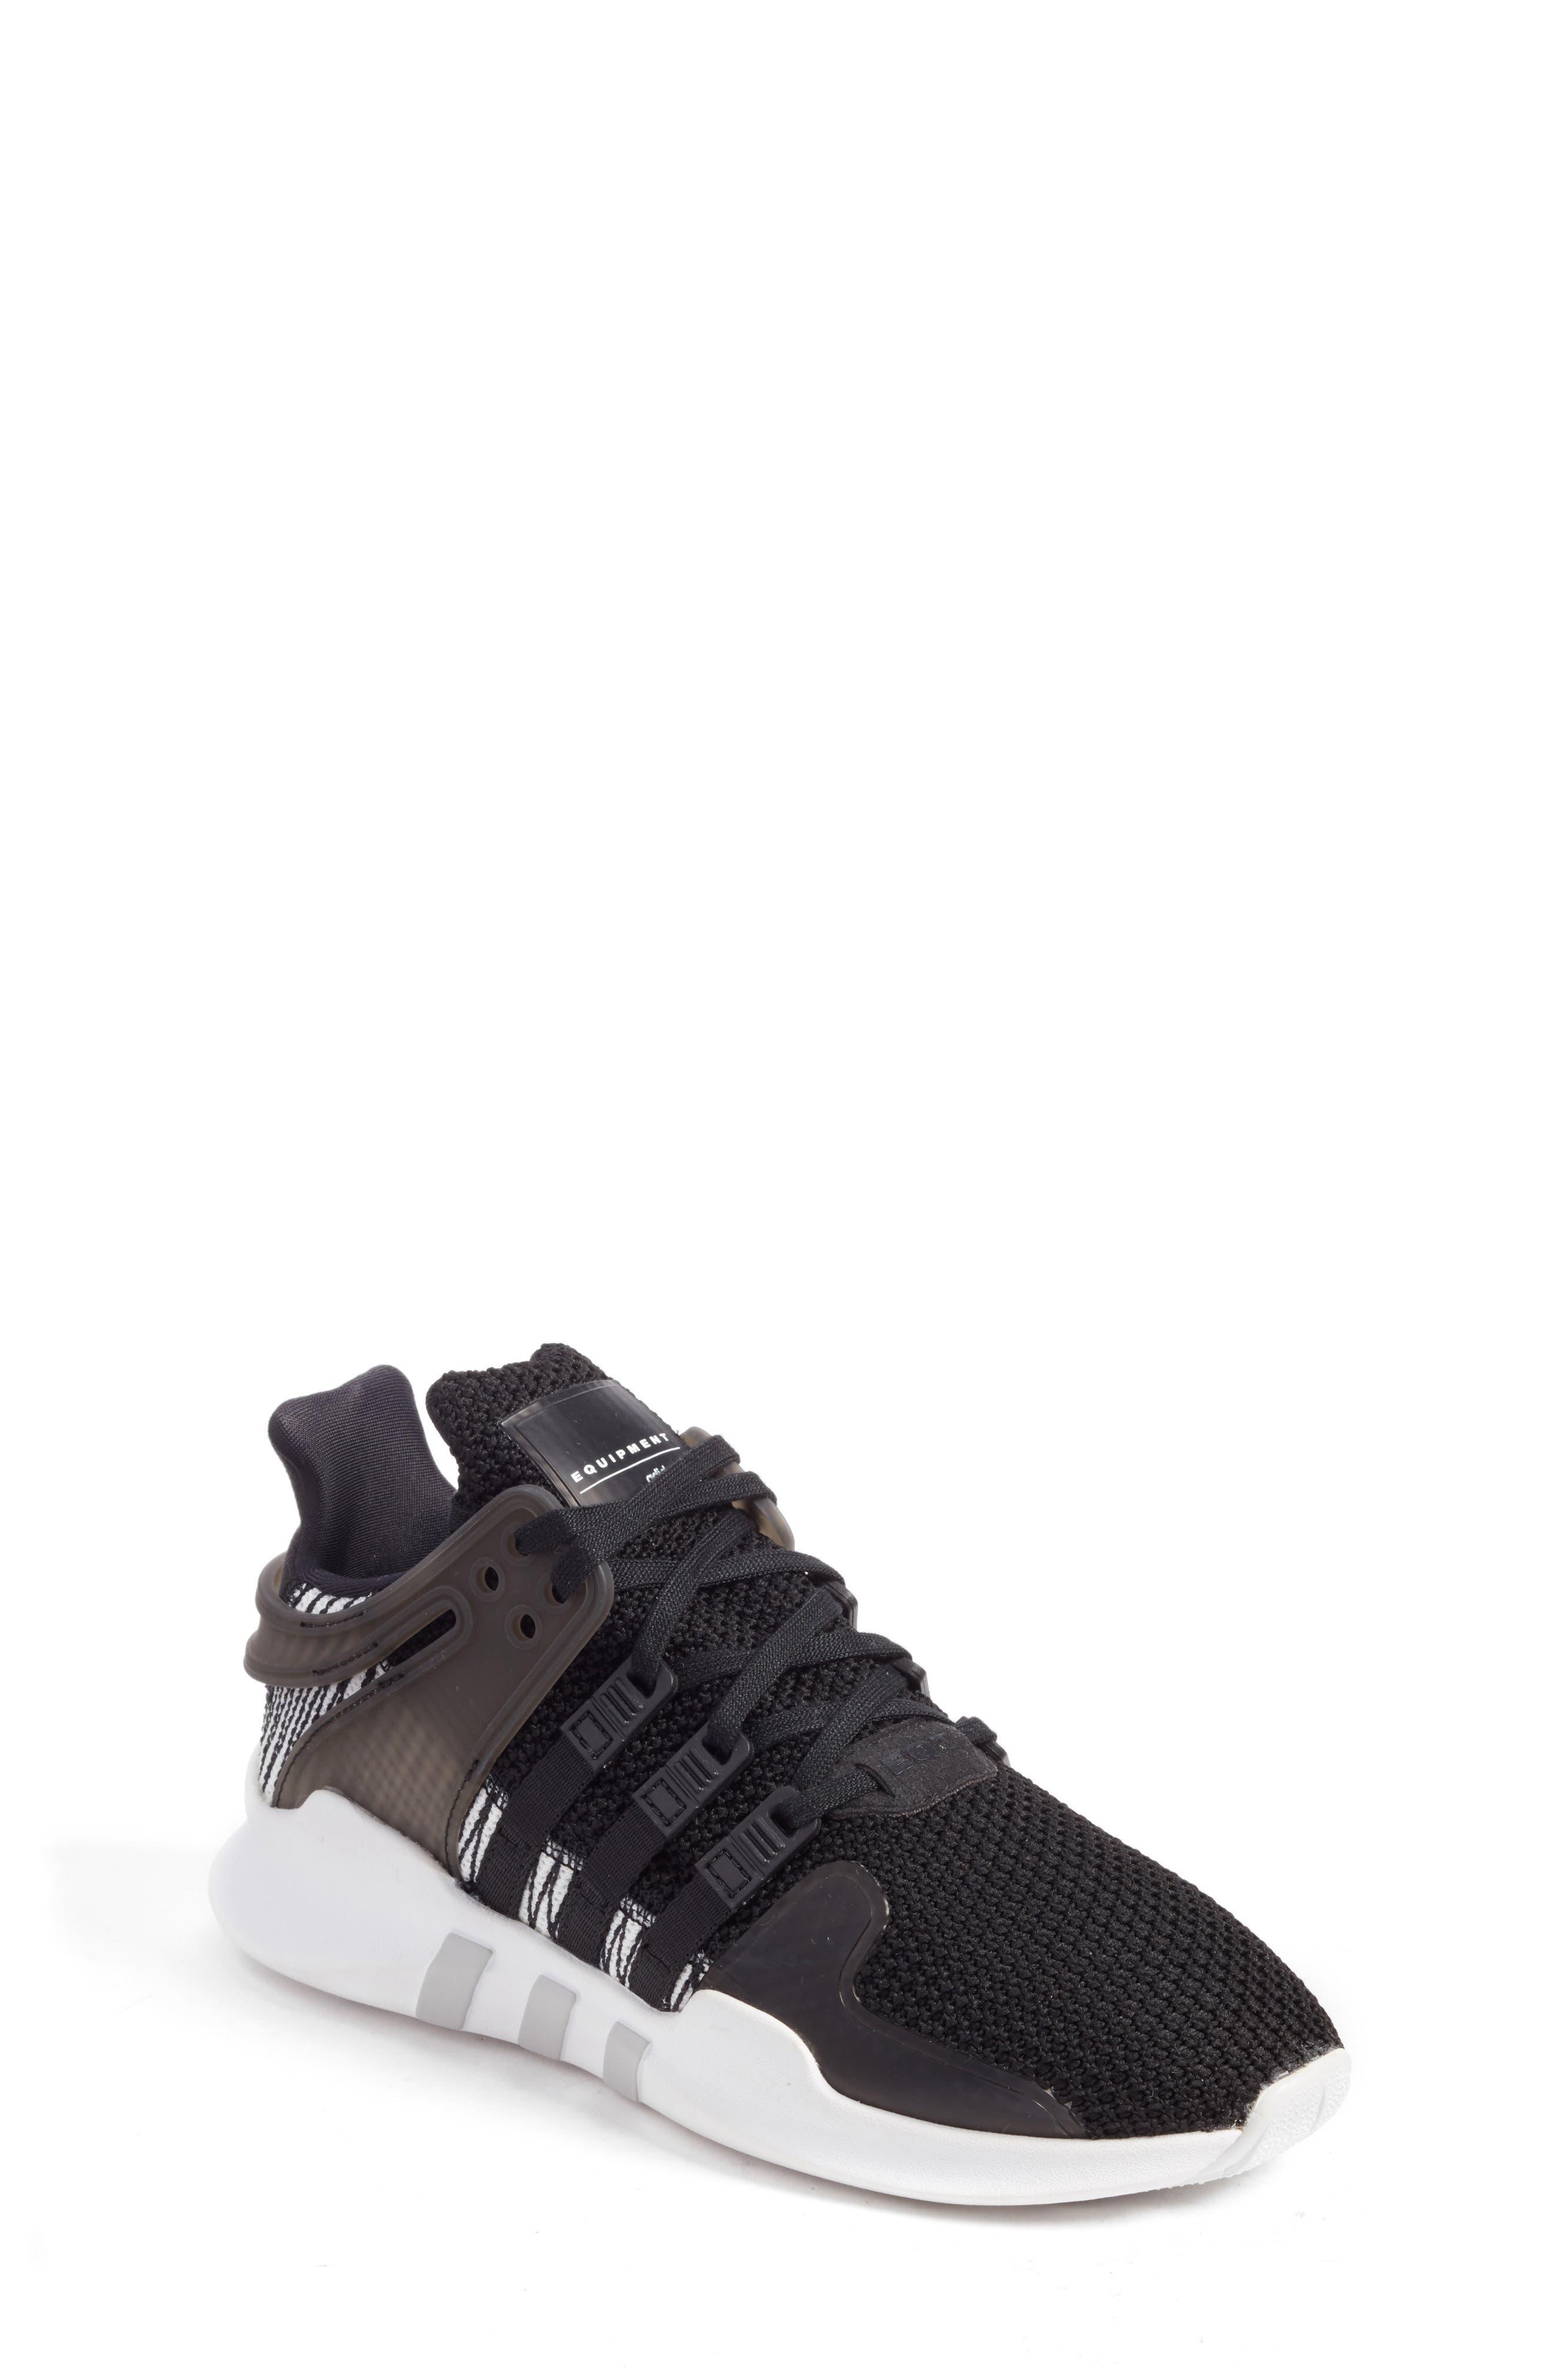 Alternate Image 1 Selected - adidas EQT Support Adv J Sneaker (Big Kid)